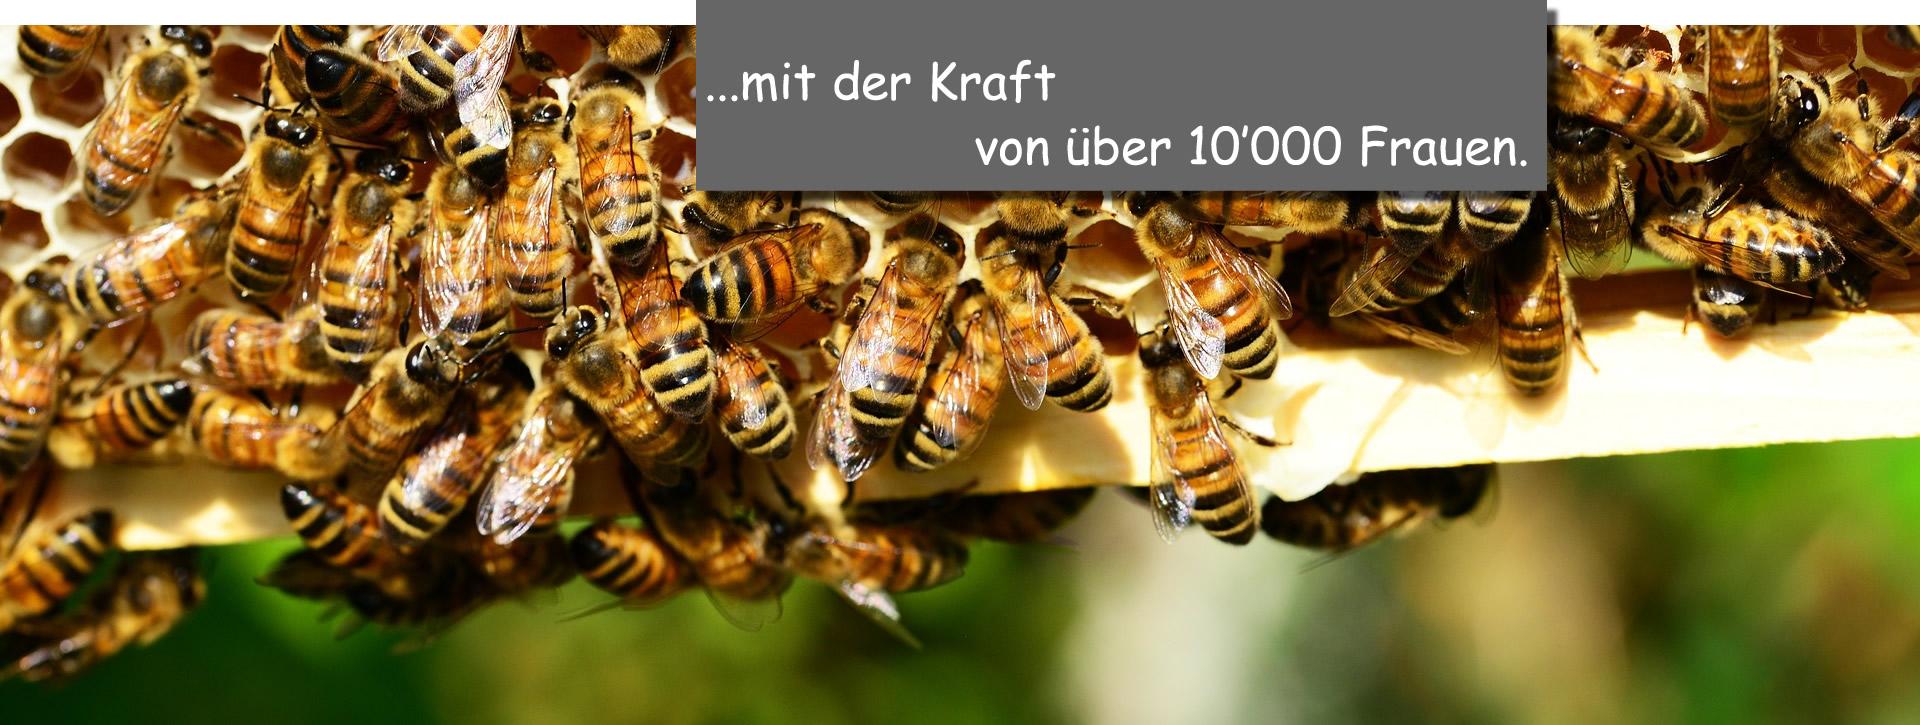 viele_Bienen_fertig